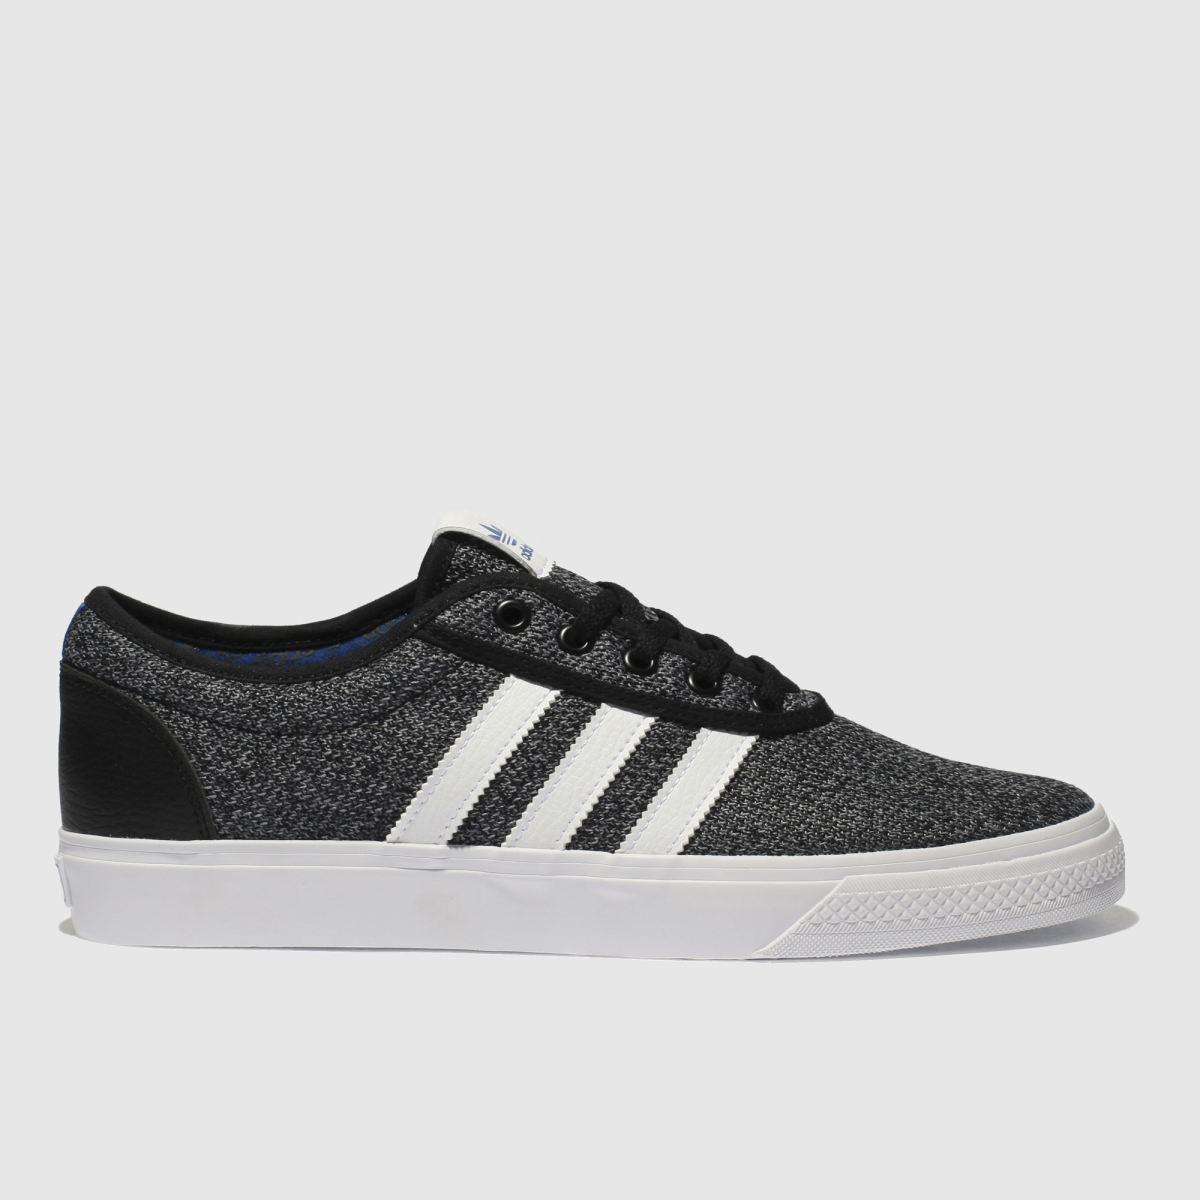 Adidas Skateboarding Black & Grey Adi-ease Trainers